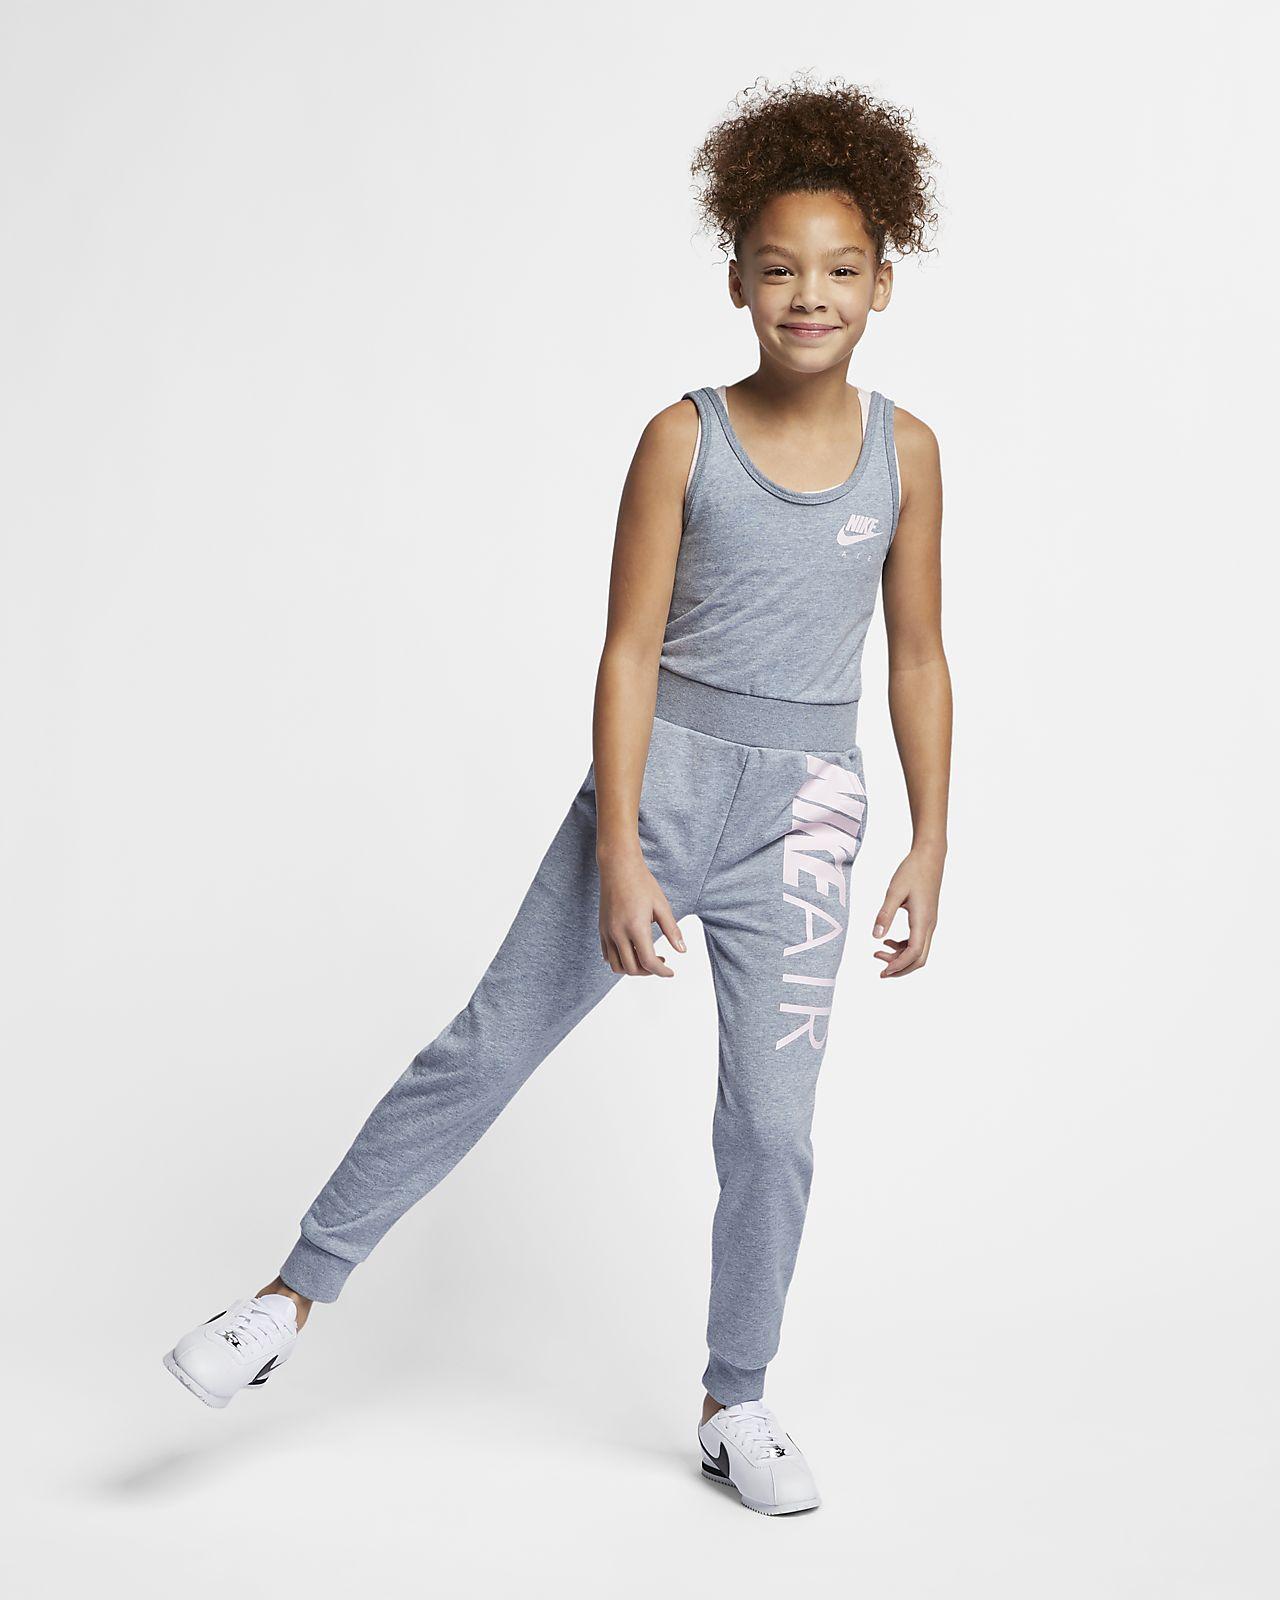 huge discount 4fc1d d5c15 ... Nike Air Big Kids  (Girls ) Jumpsuit